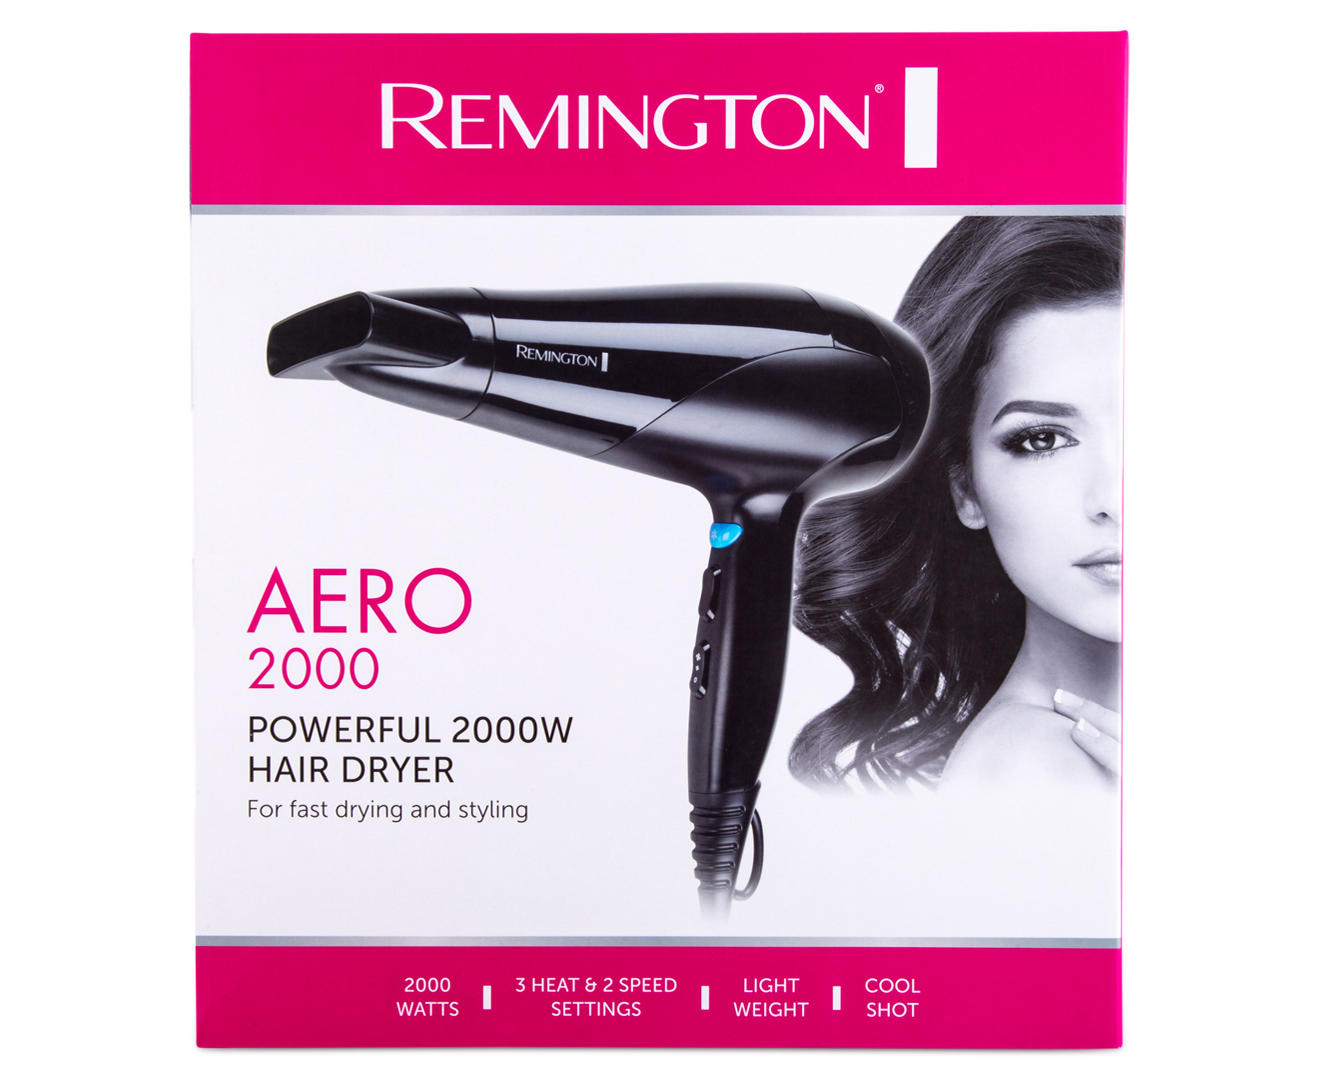 7bfc4147e Remington Aero 2000 Hair Dryer